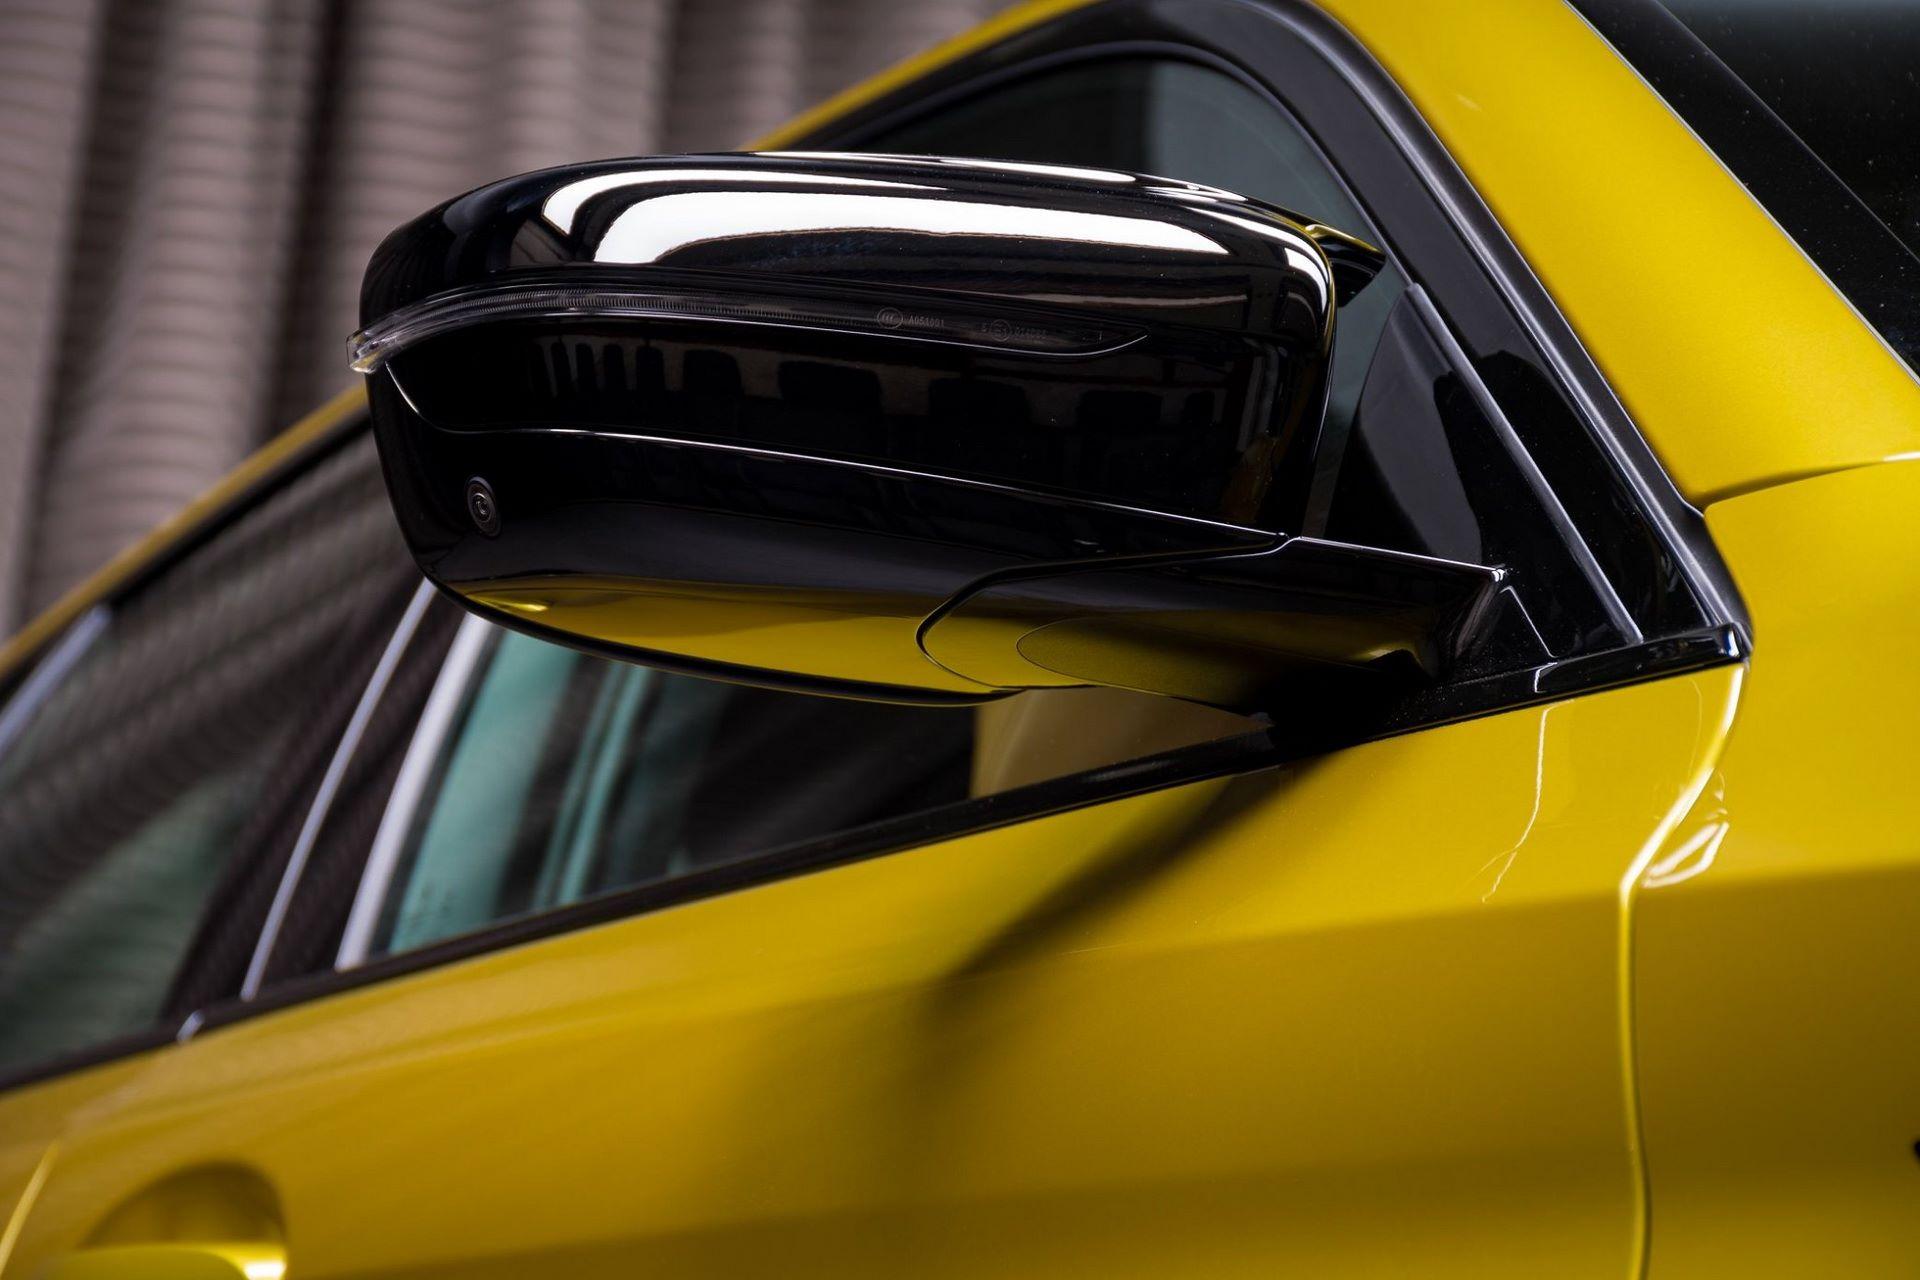 BMW-M5-Competition-Austin-Yellow-Abu-Dhabi-Motors-26